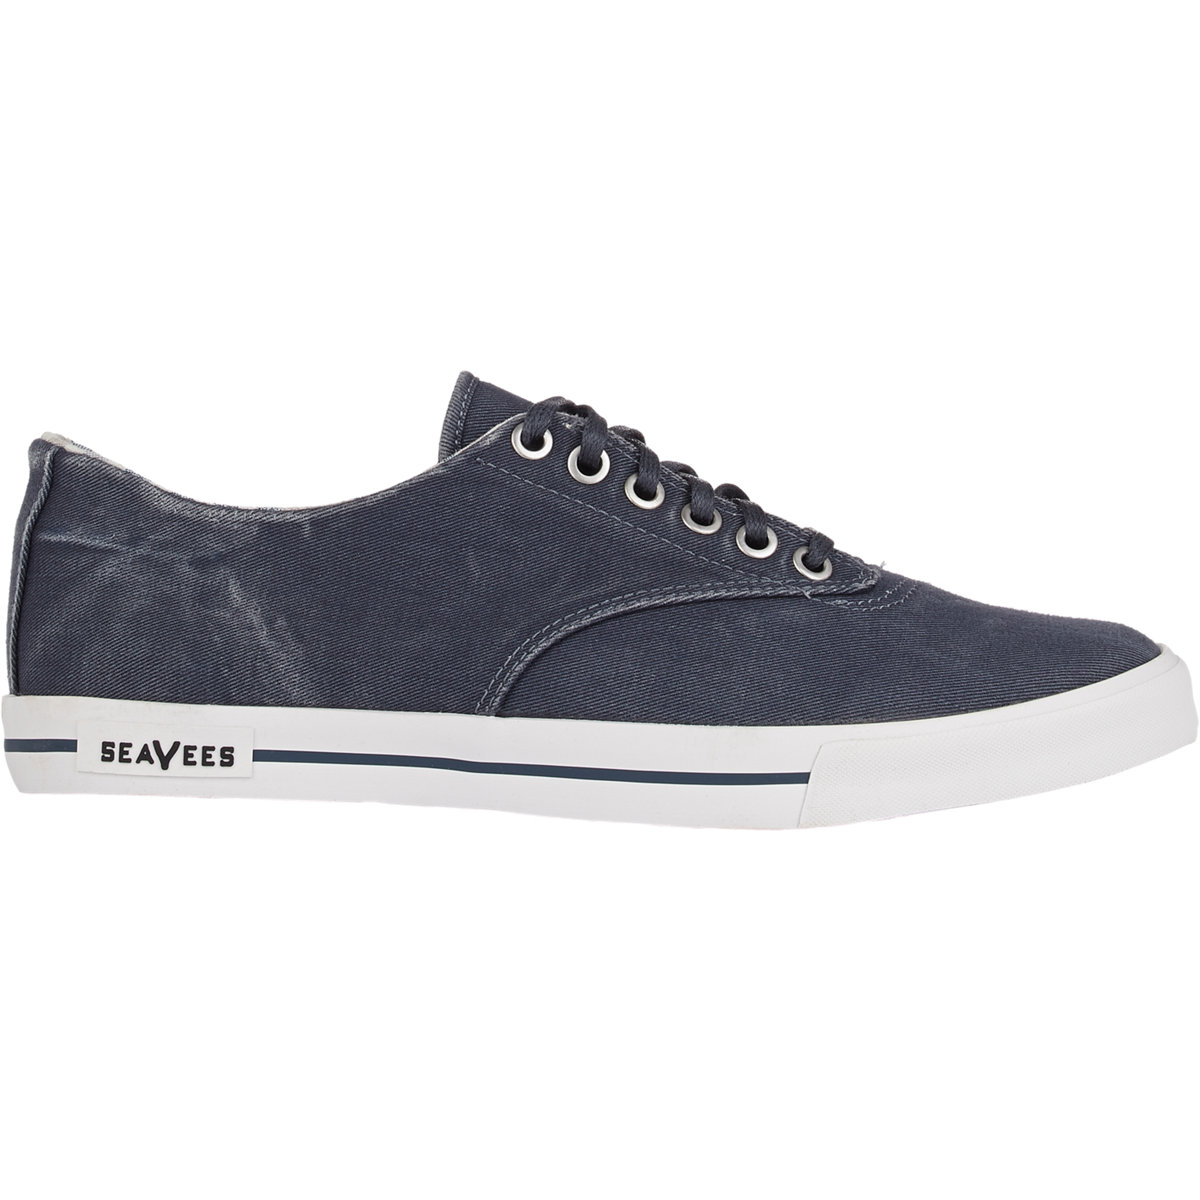 Seavees Brand Shoes